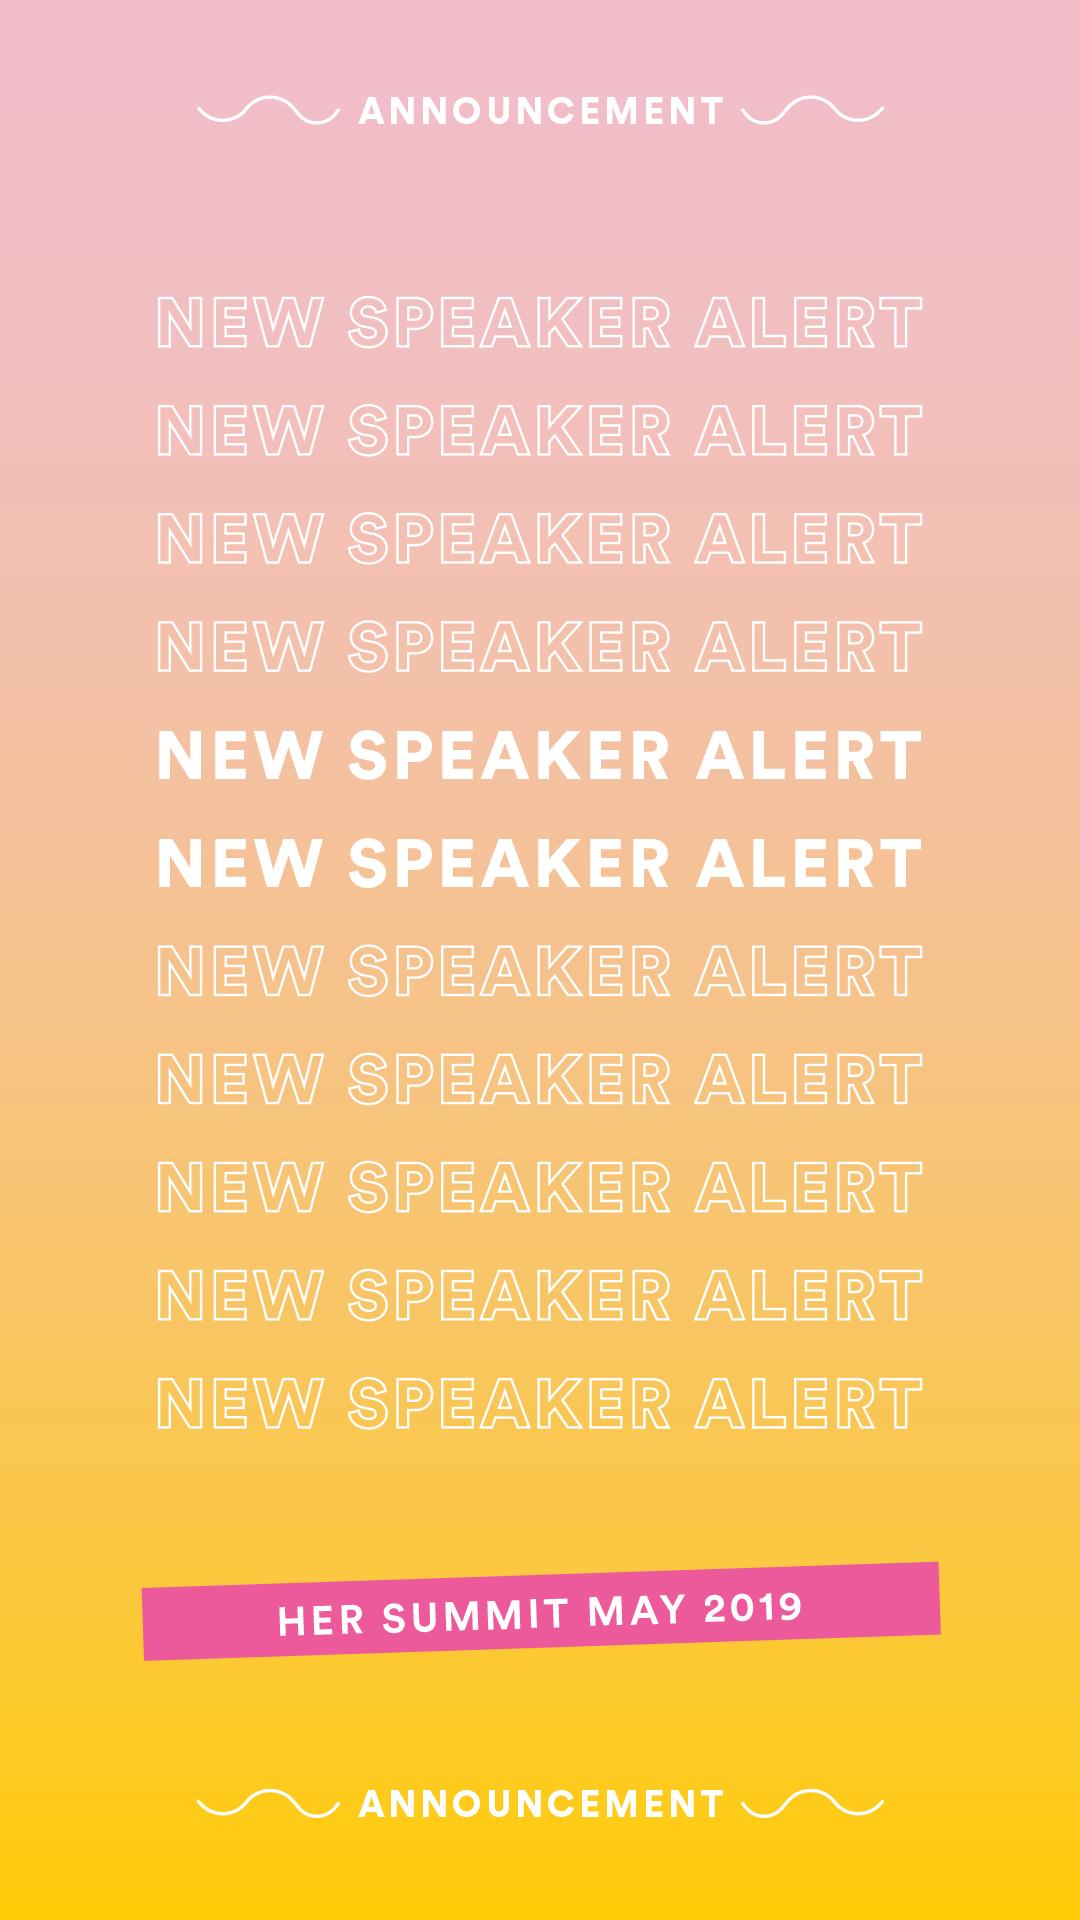 More Speakers Announced Soon!